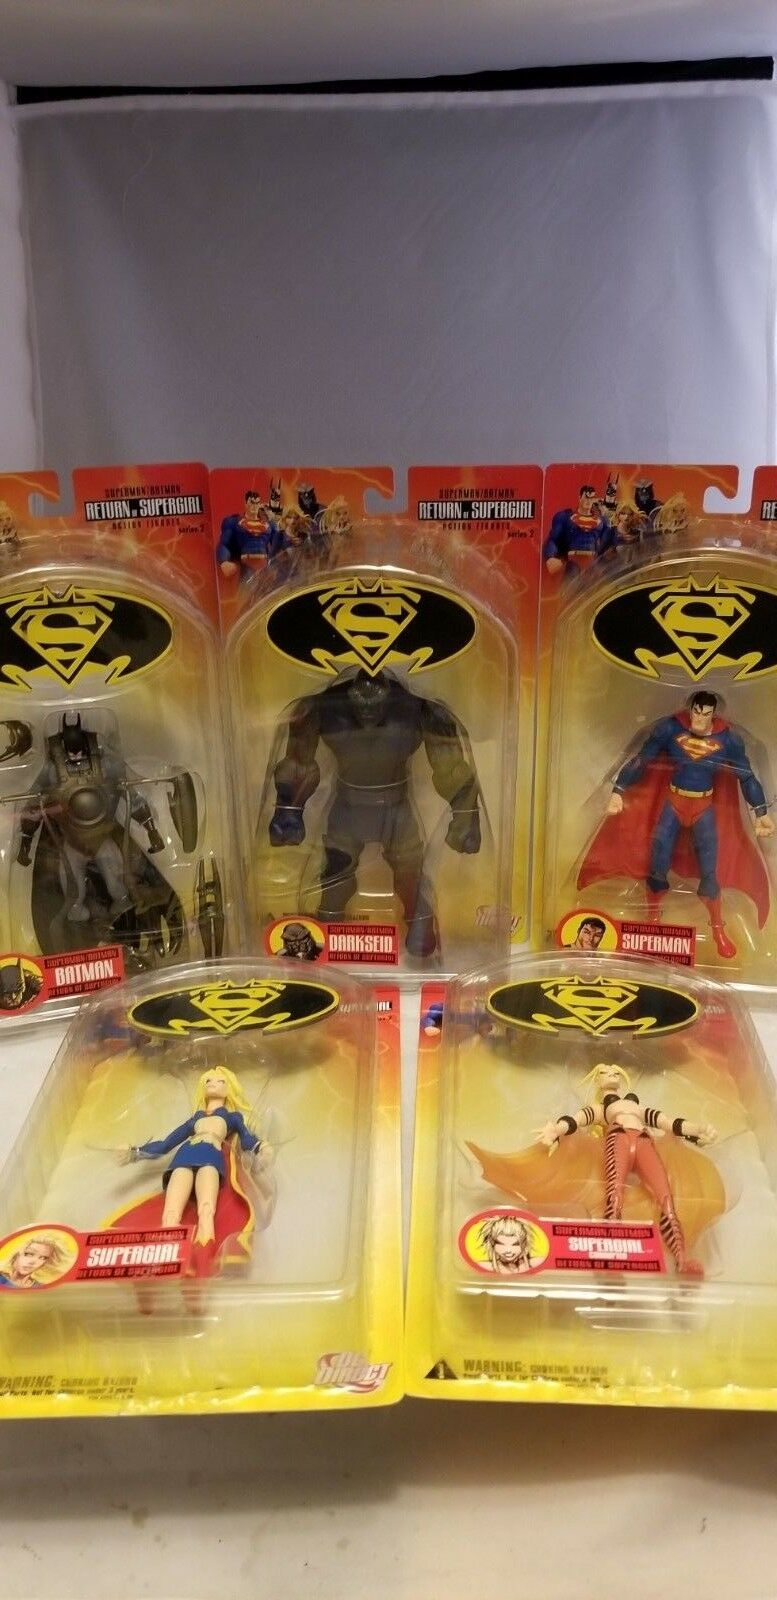 SUPERMAN BATMAN RETURN OF SUPERGIRL SERIES 2 SET OF 5 FIGURES